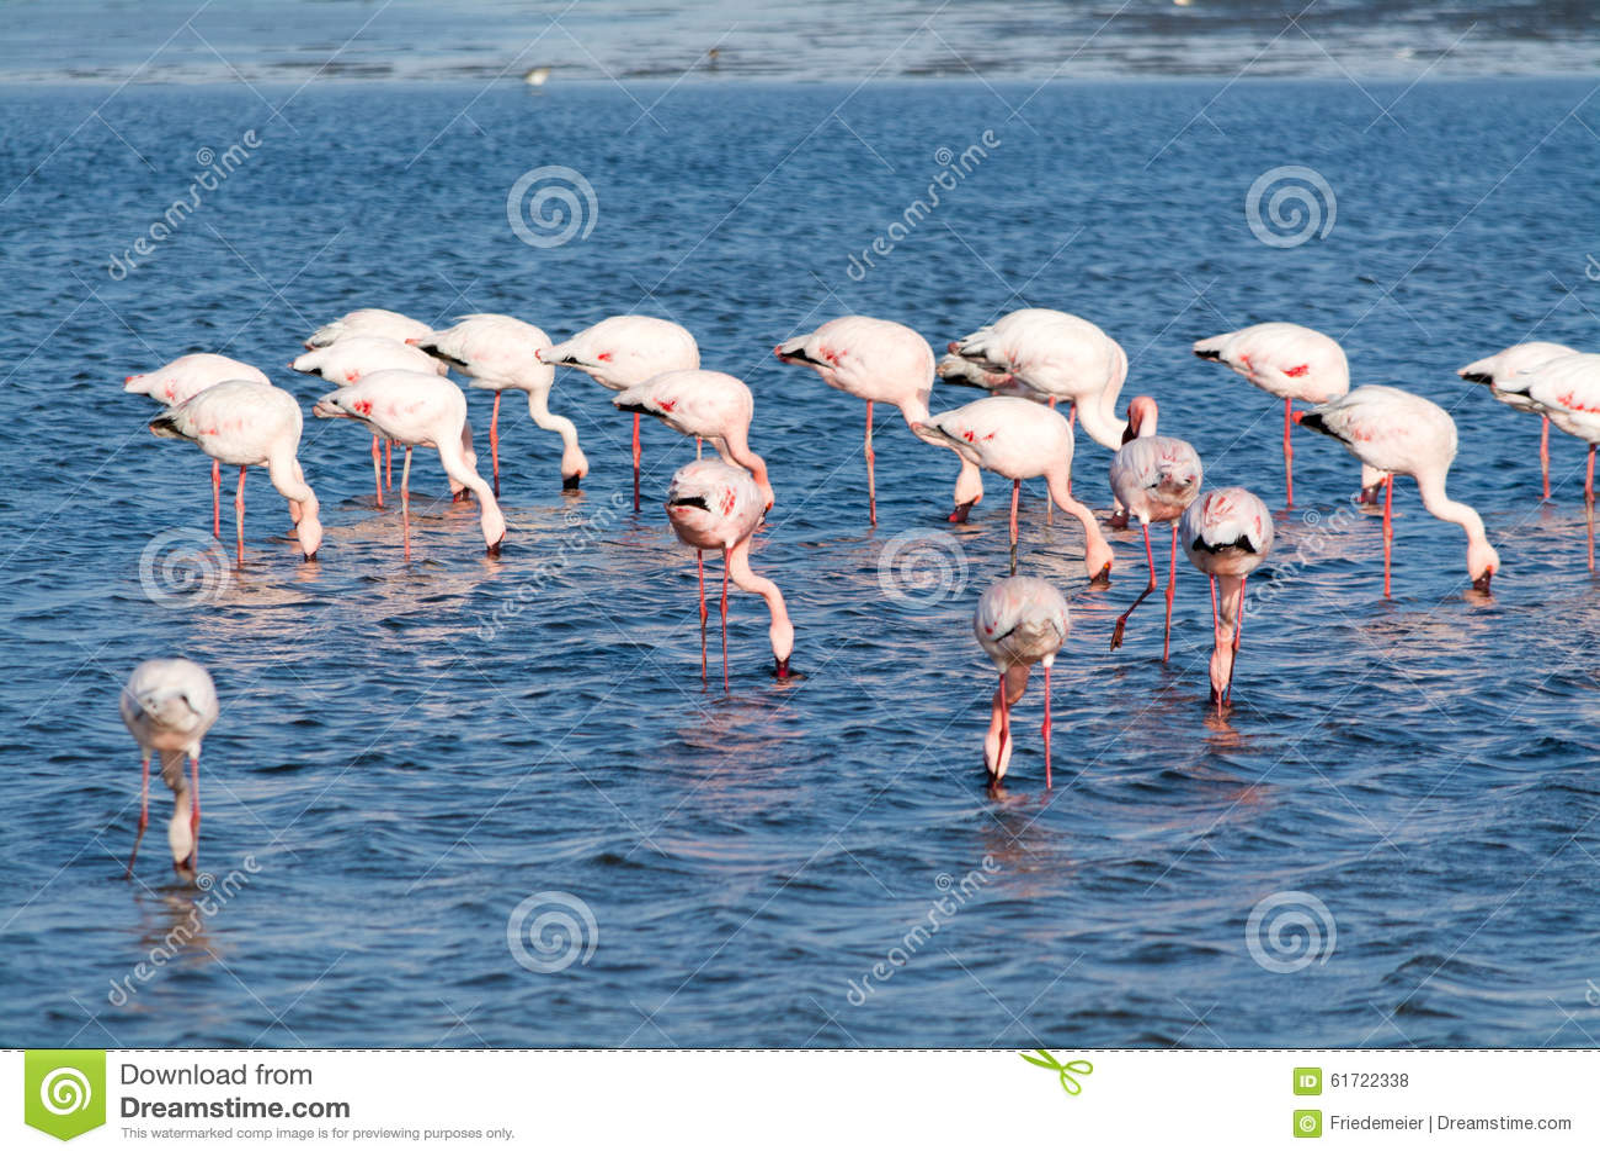 Flamingos In The Ocean Near Swakopmund. Royalty-Free Stock ...